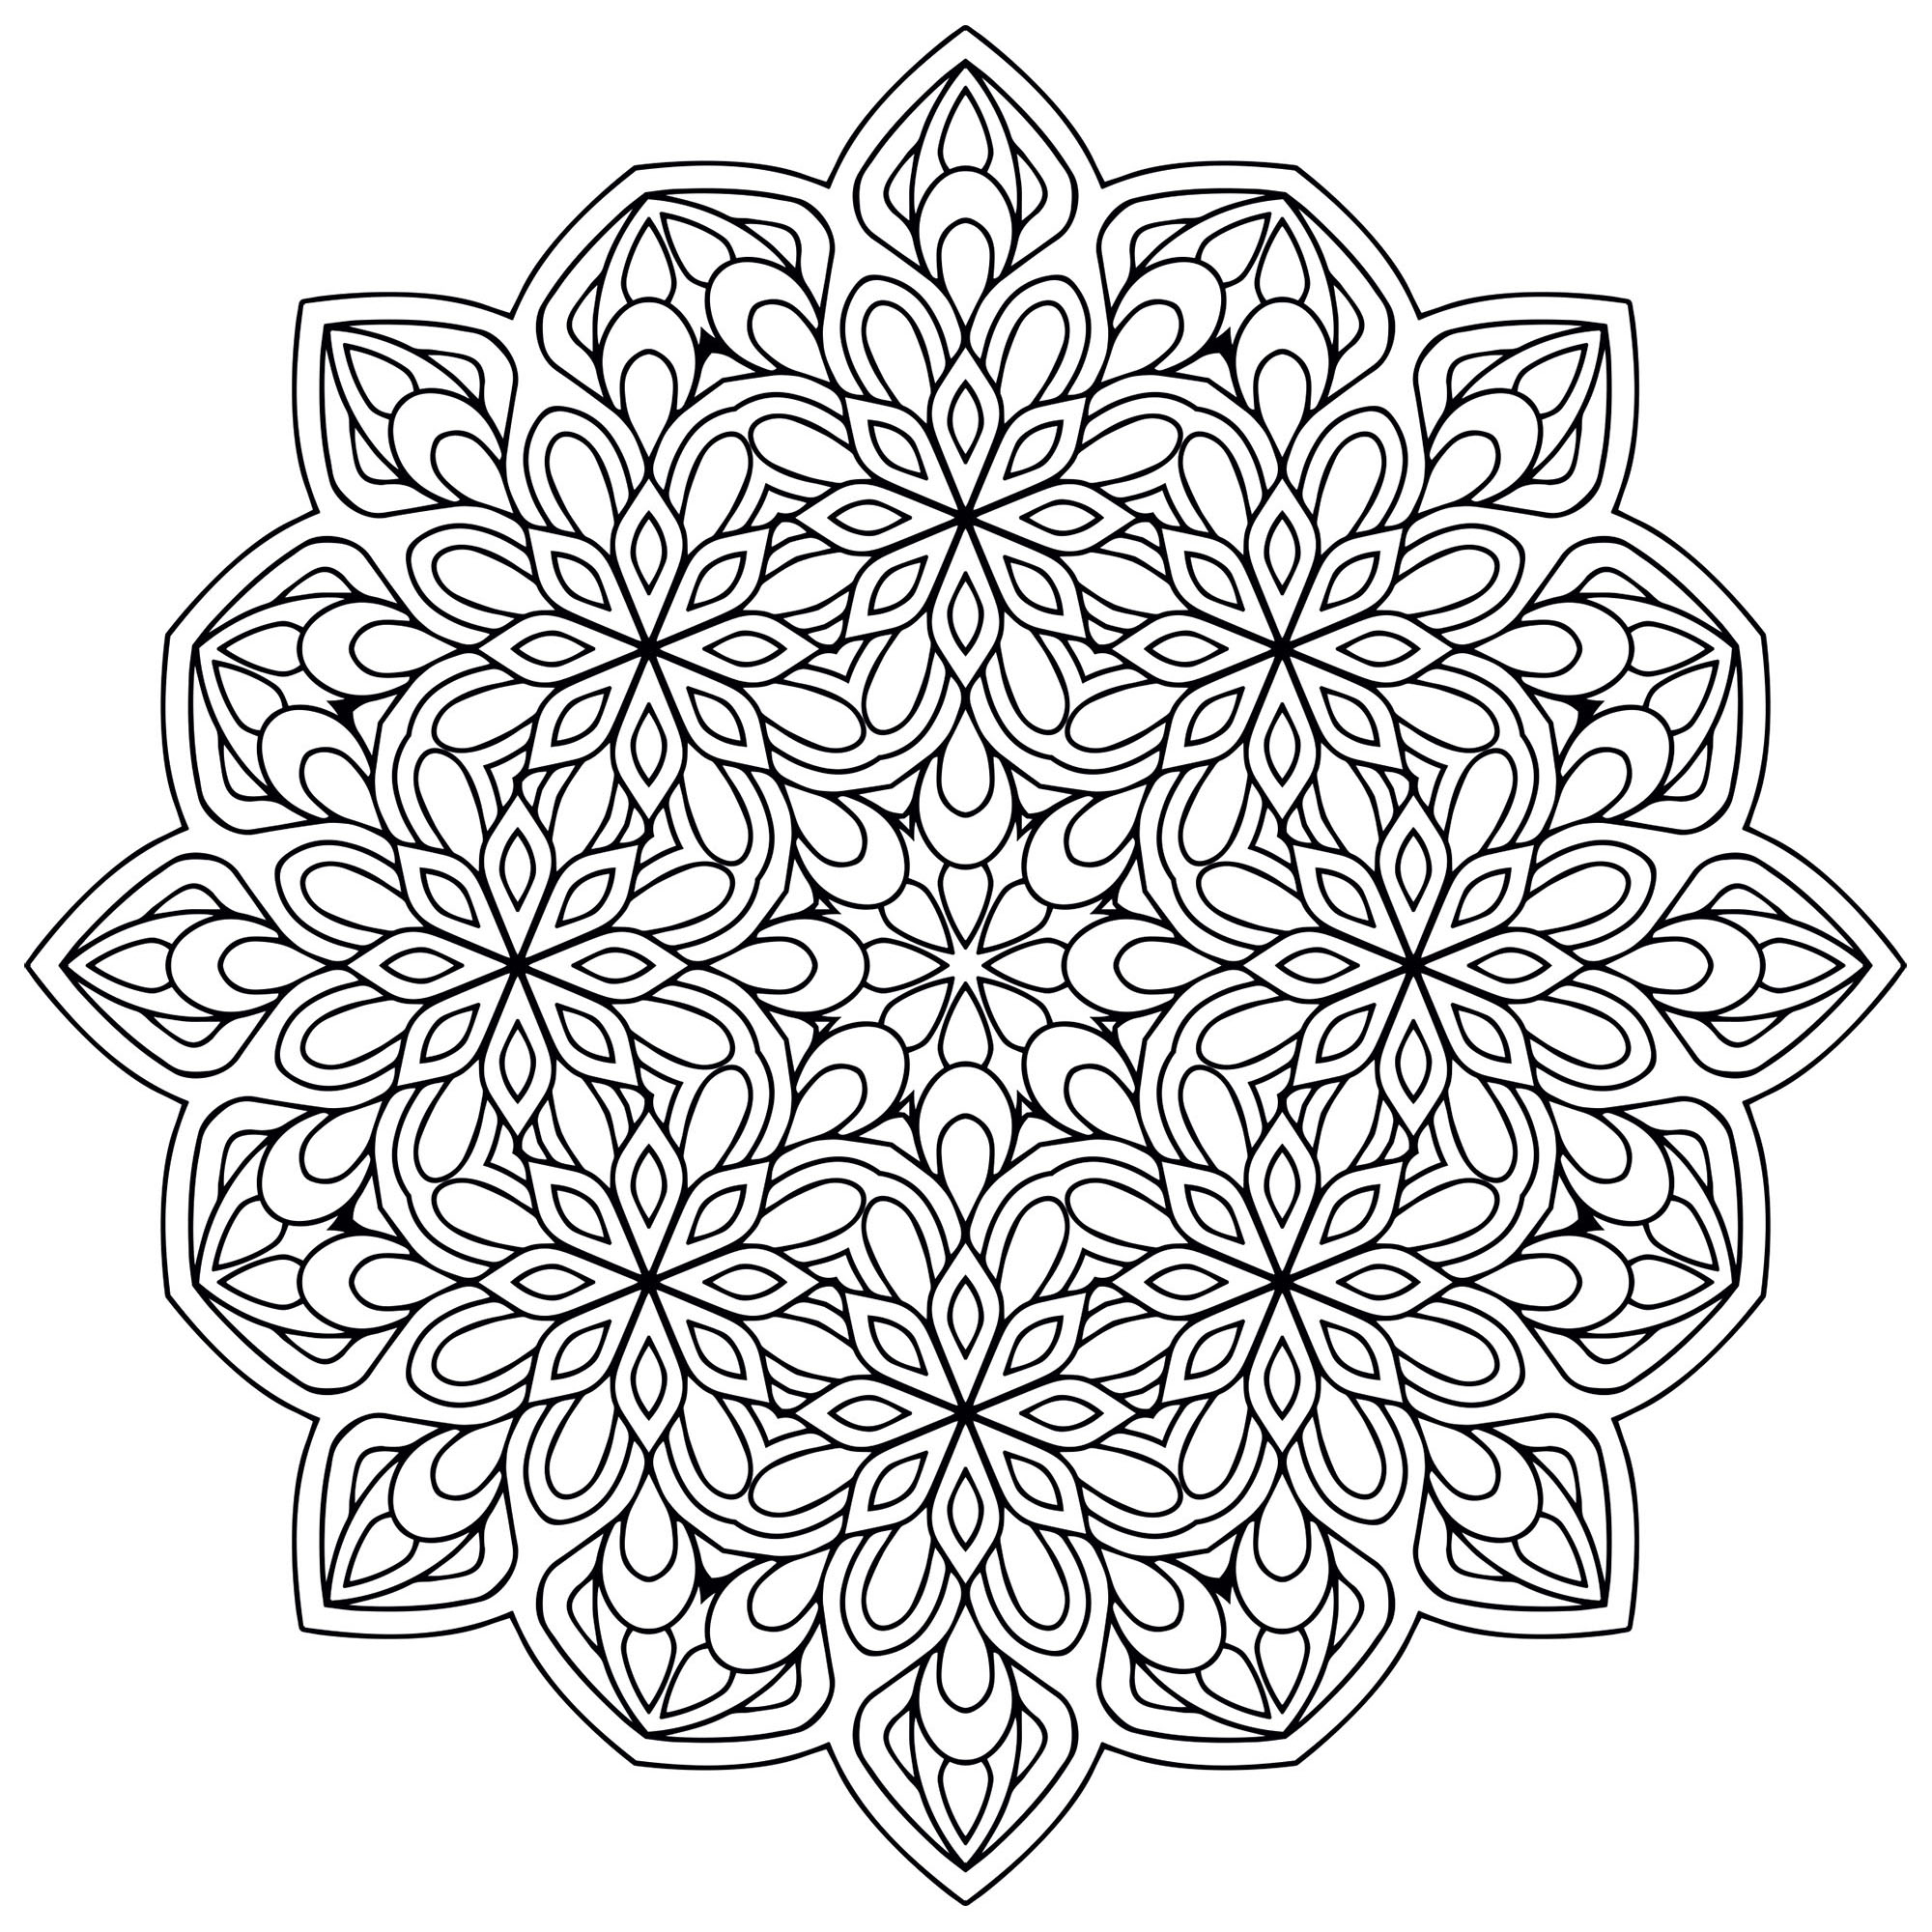 Mandala Zen Antistress 9 - Mandalas - Coloriages avec Coloriage Anti Stress Adulte